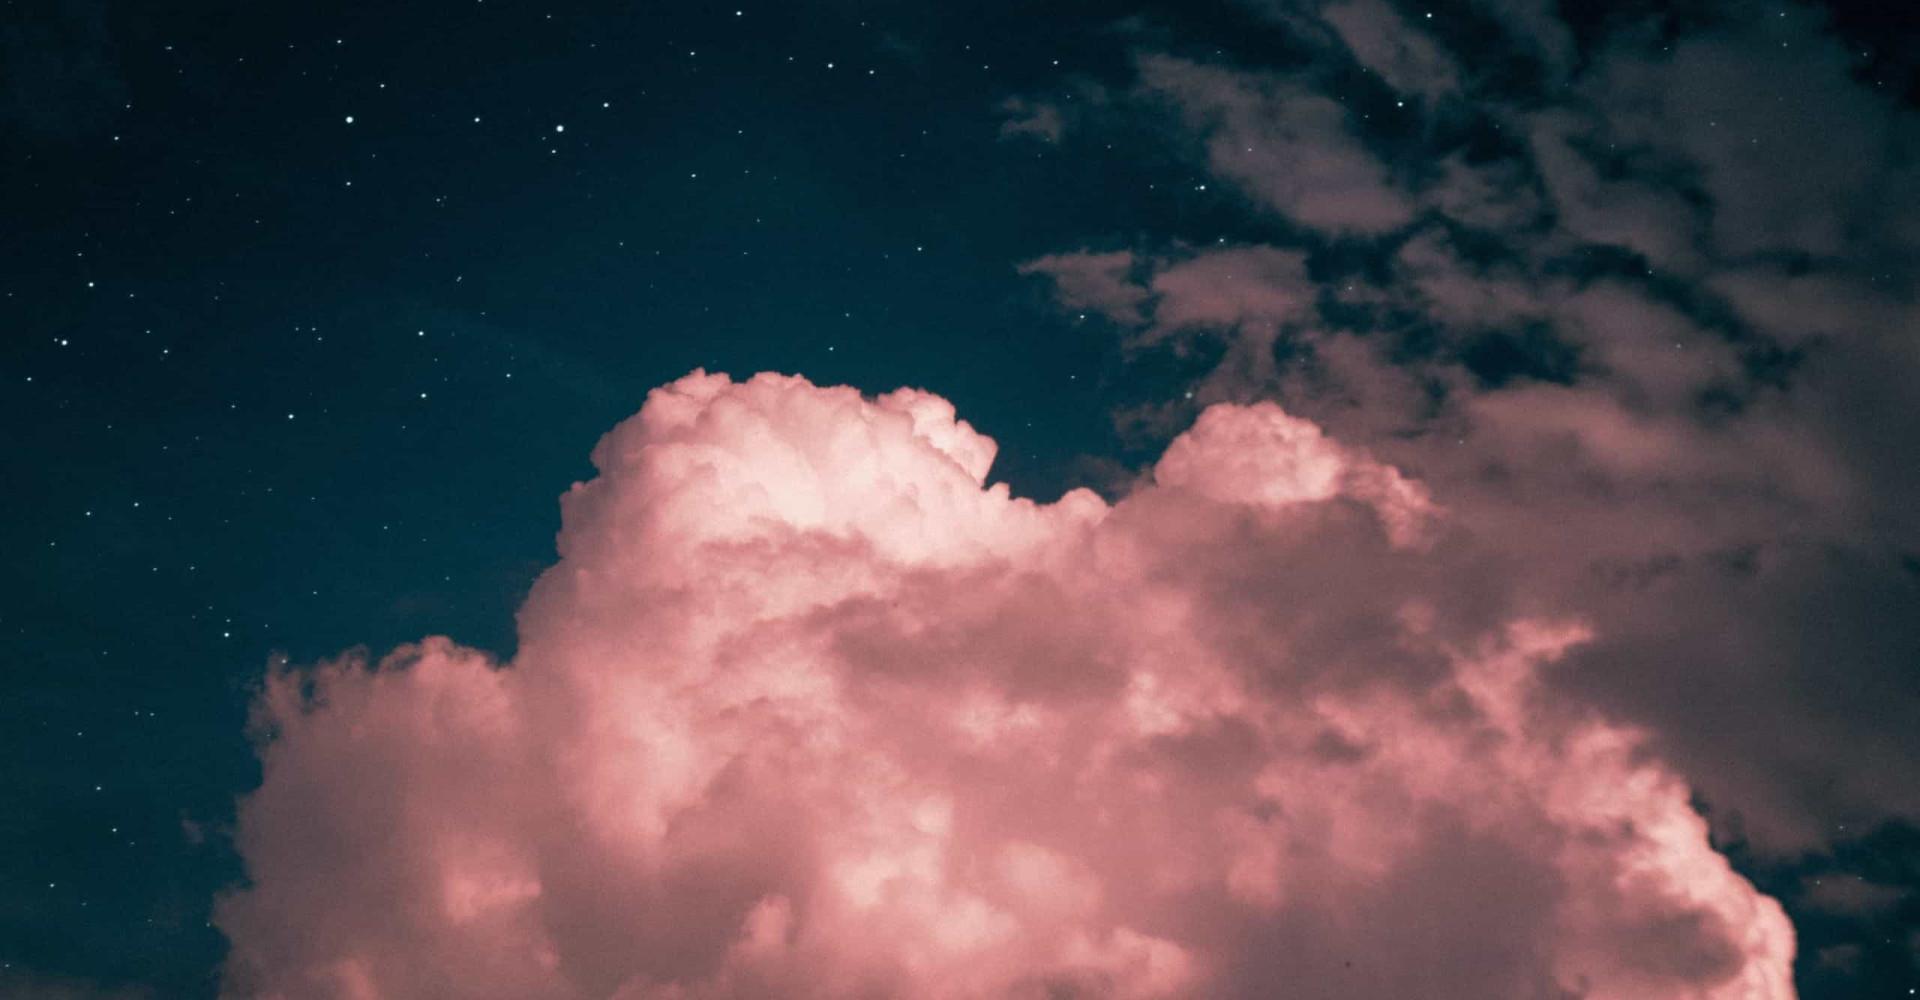 The benefits of cloud gazing